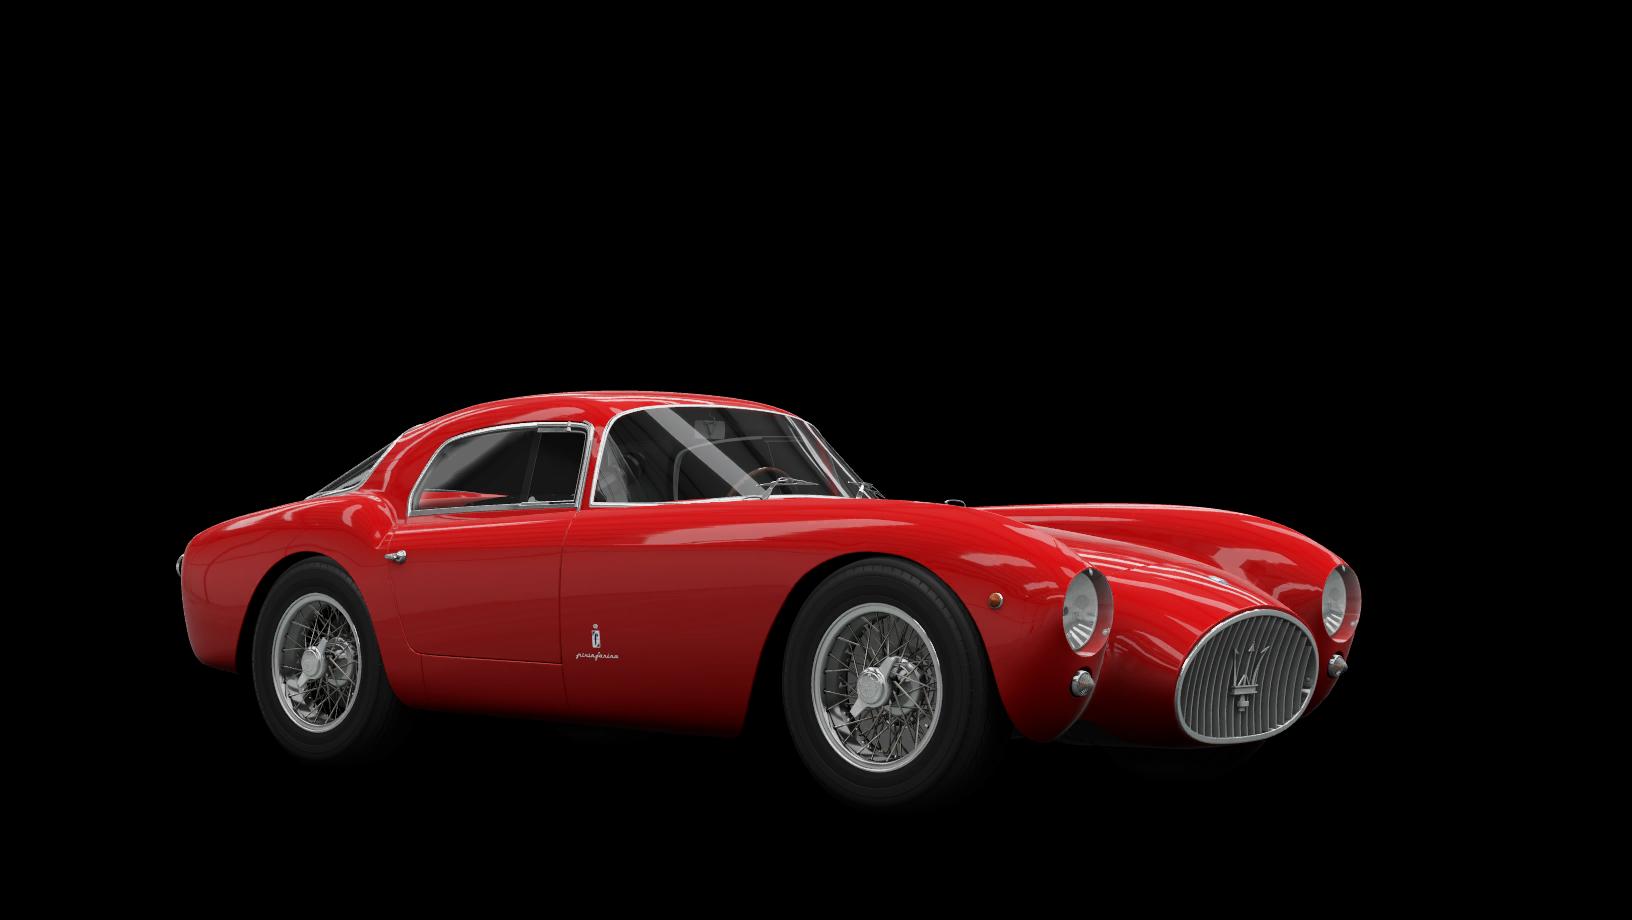 Maserati A6GCS/53 Pininfarina Berlinetta